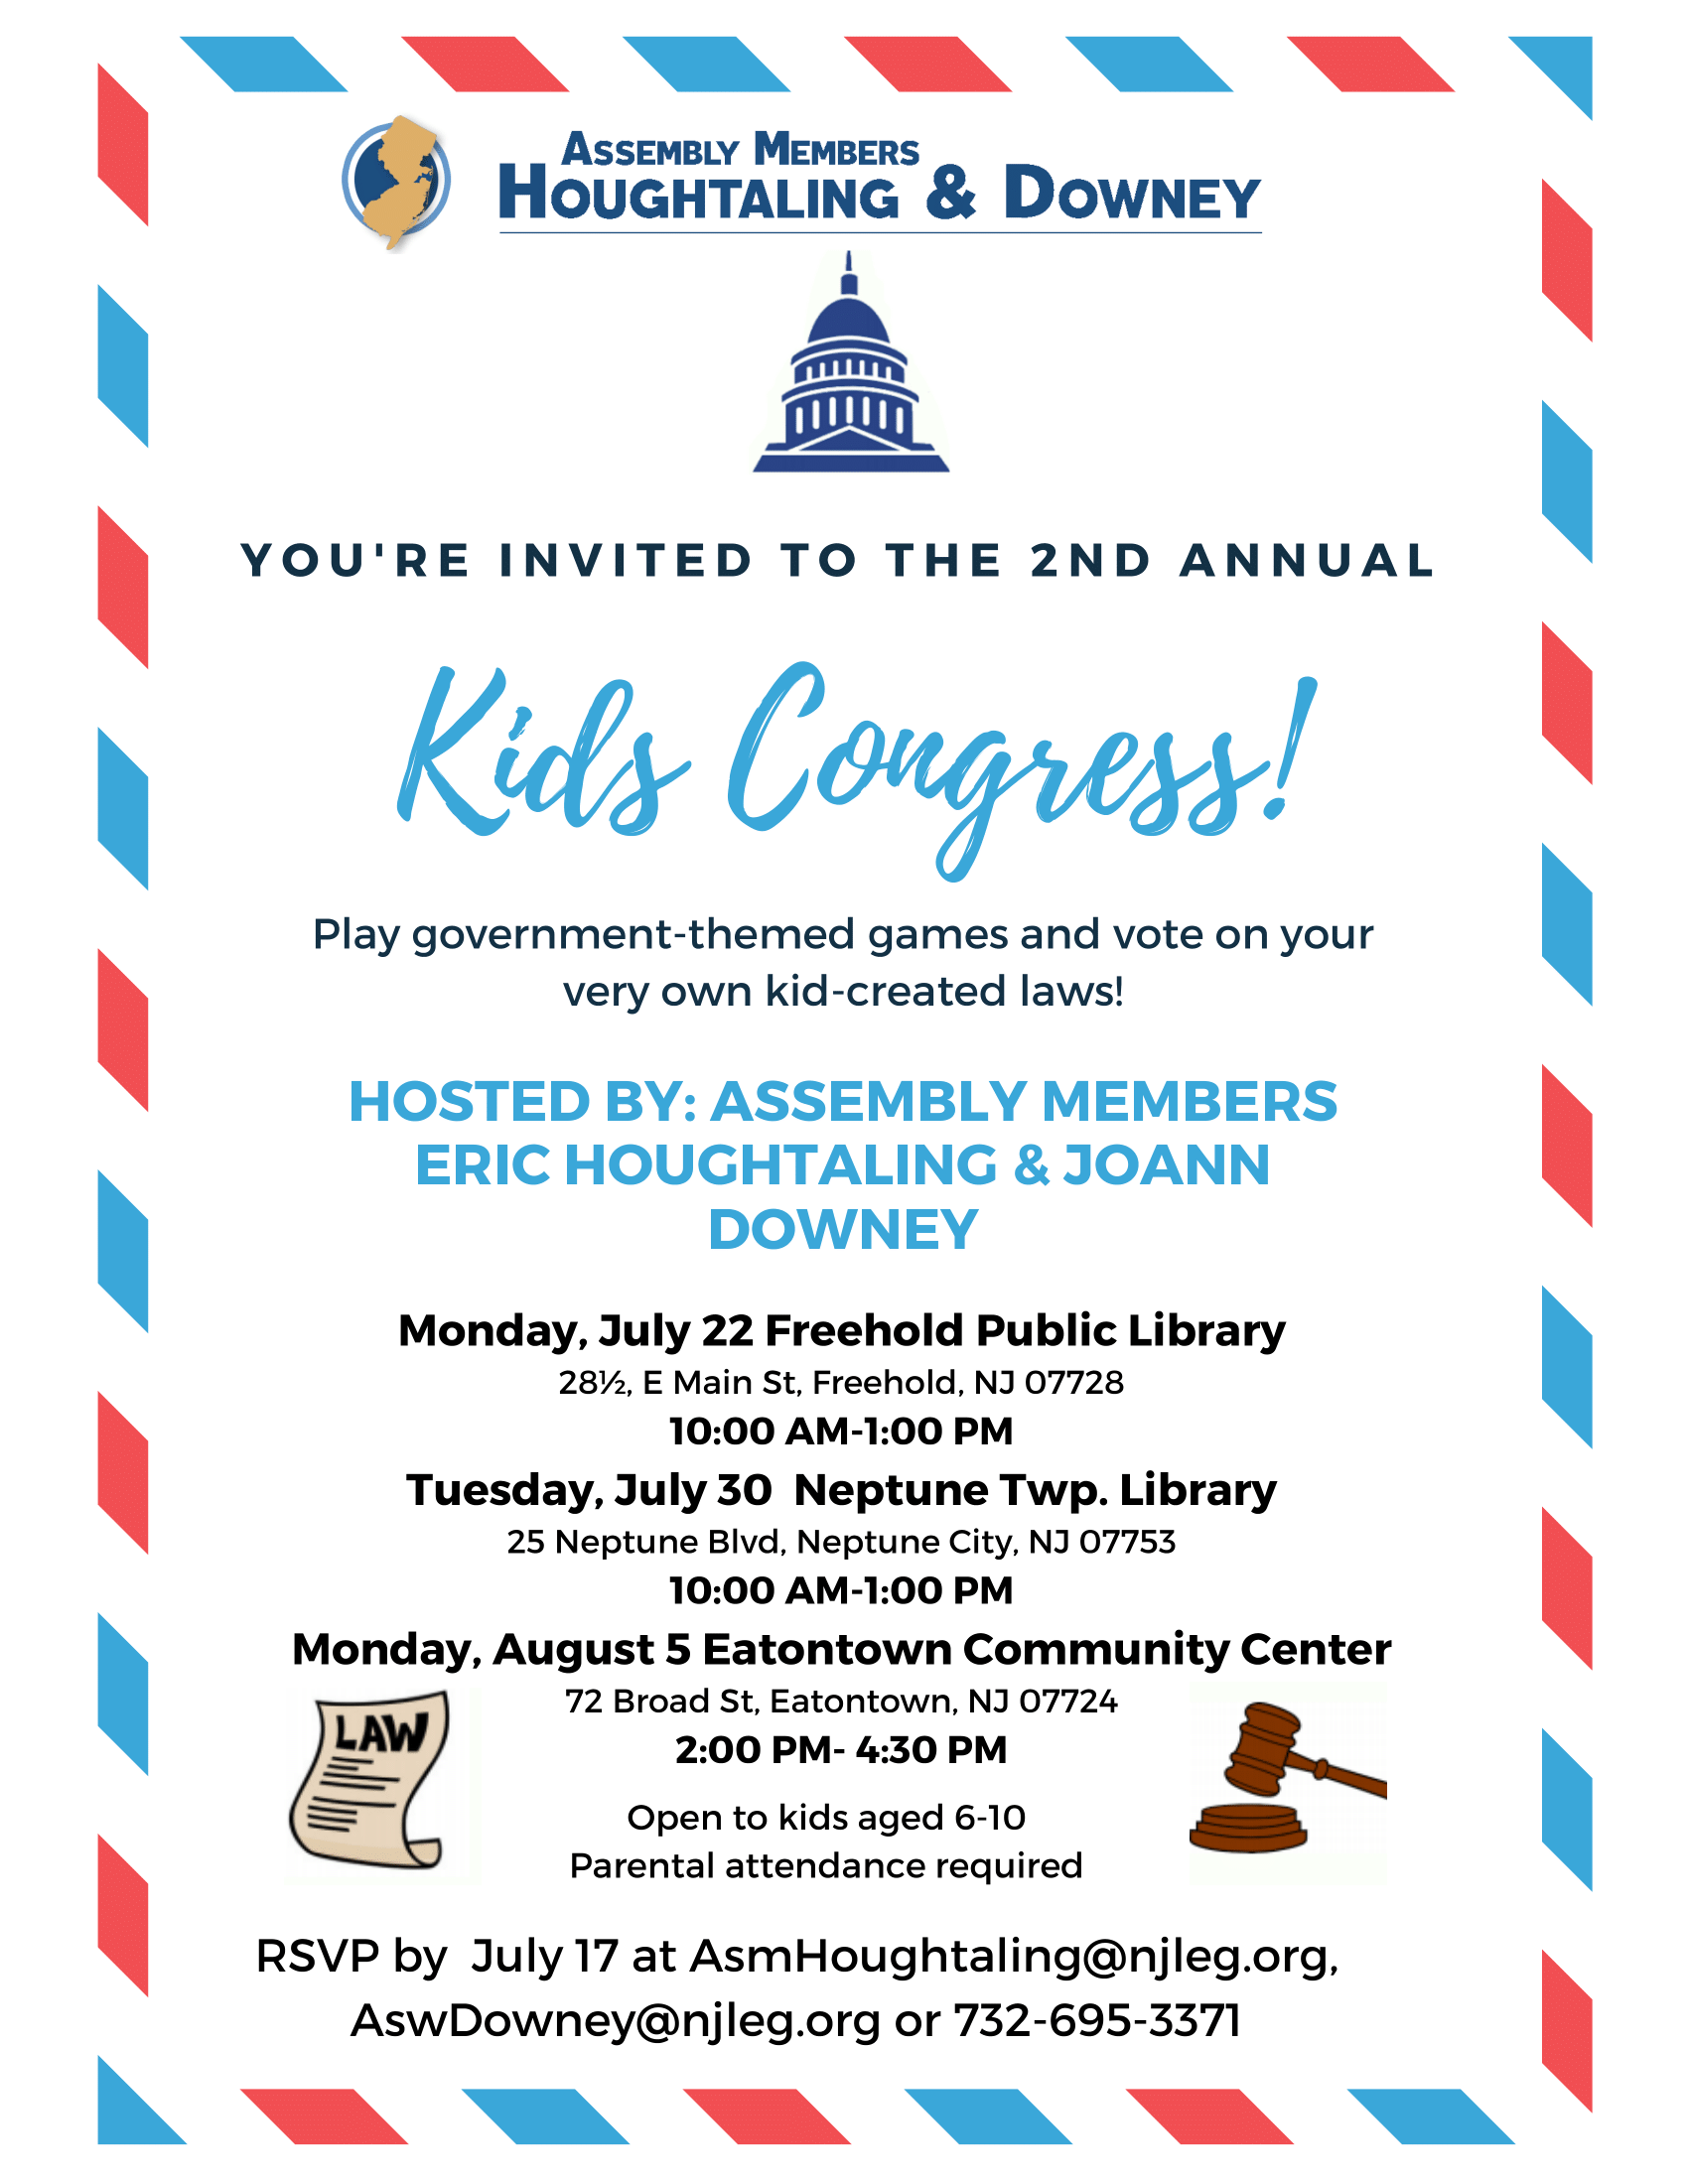 2019_2nd_Annual_Kids_Congress_Flyer_UPDATED_FINAL_(1)-1.png